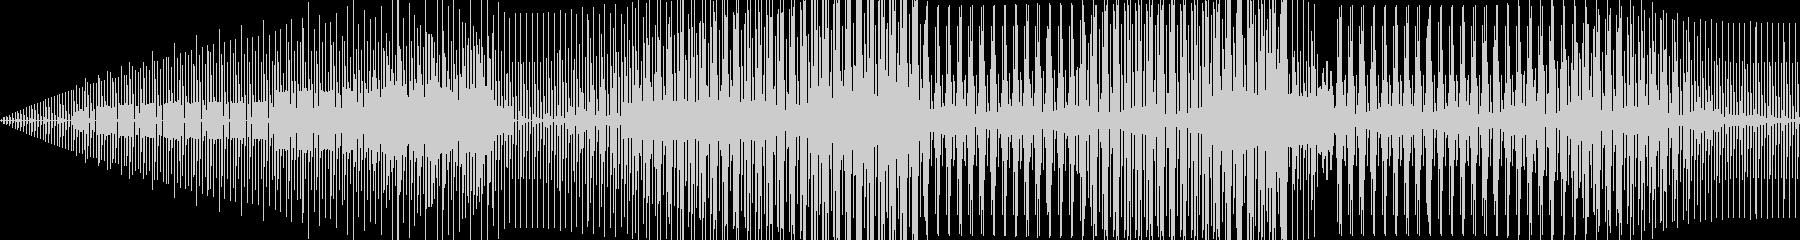 Electro.Instrumen...の未再生の波形